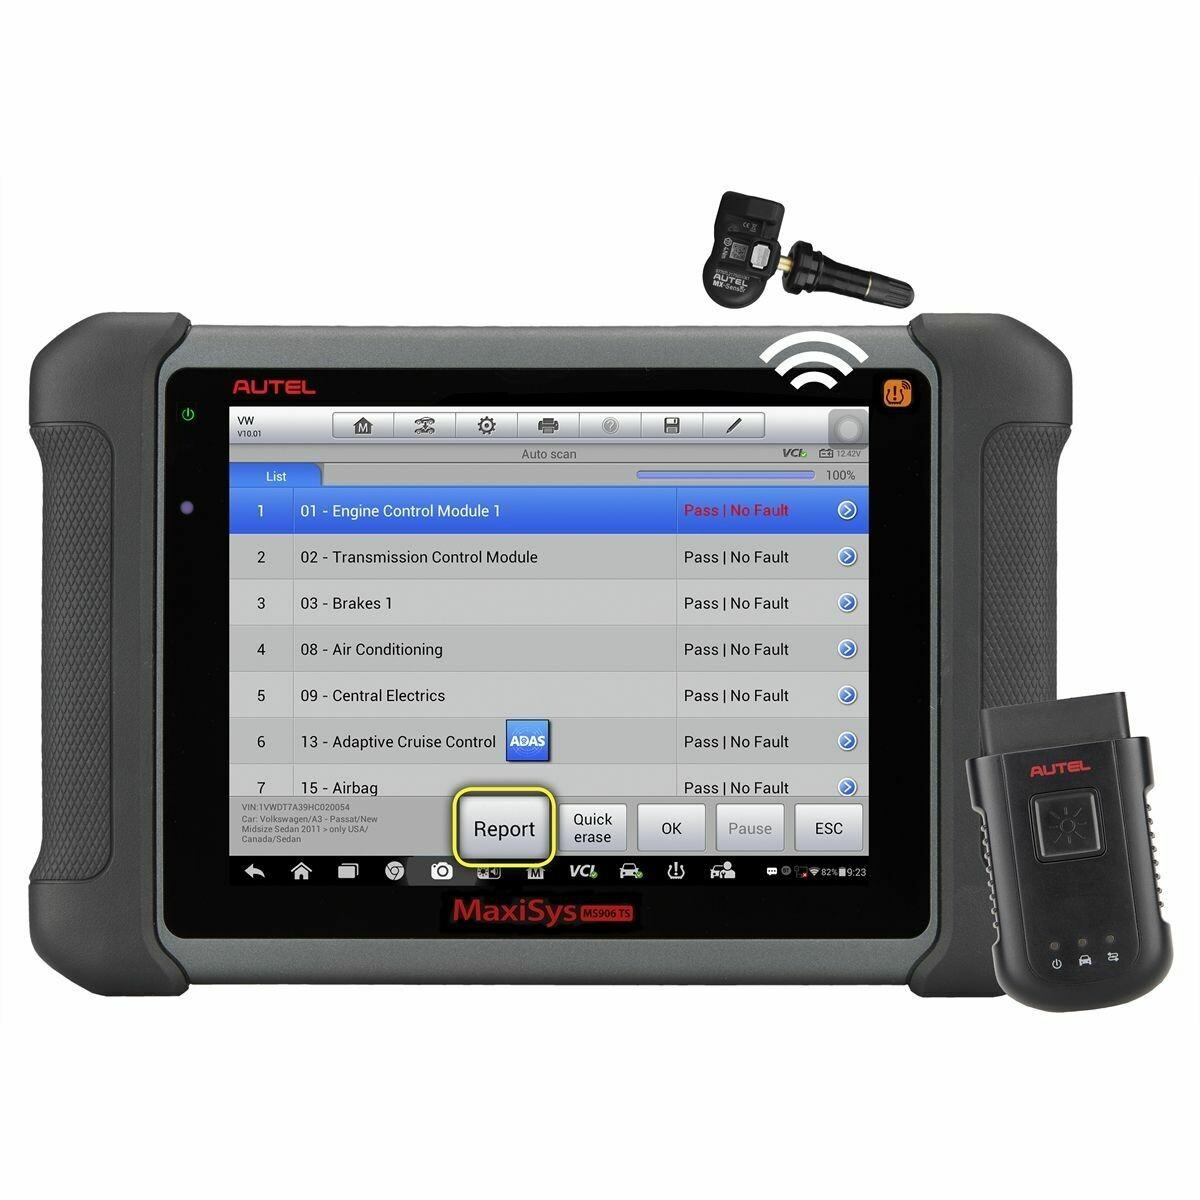 AUTEL MaxiSYS 906TS Diagnostic System & Comprehensive TPMS Service Device